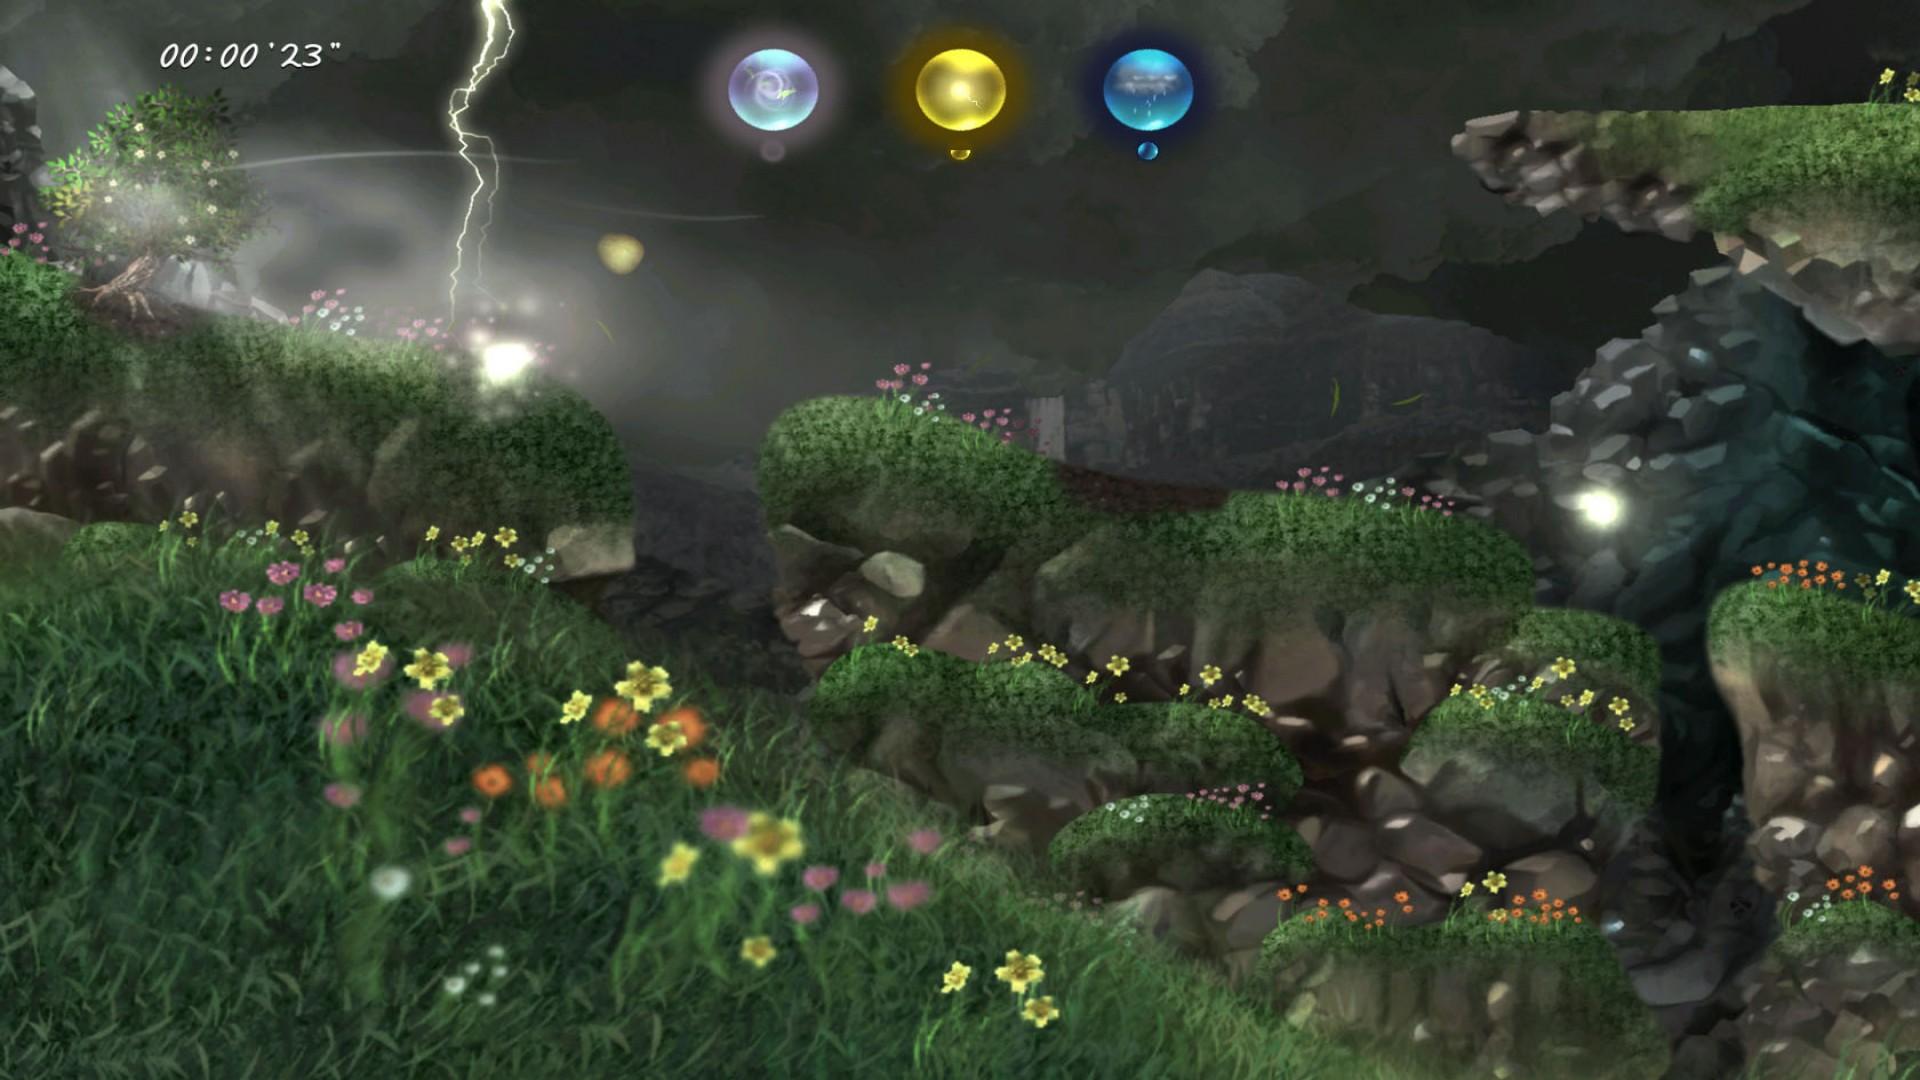 Storm screenshot